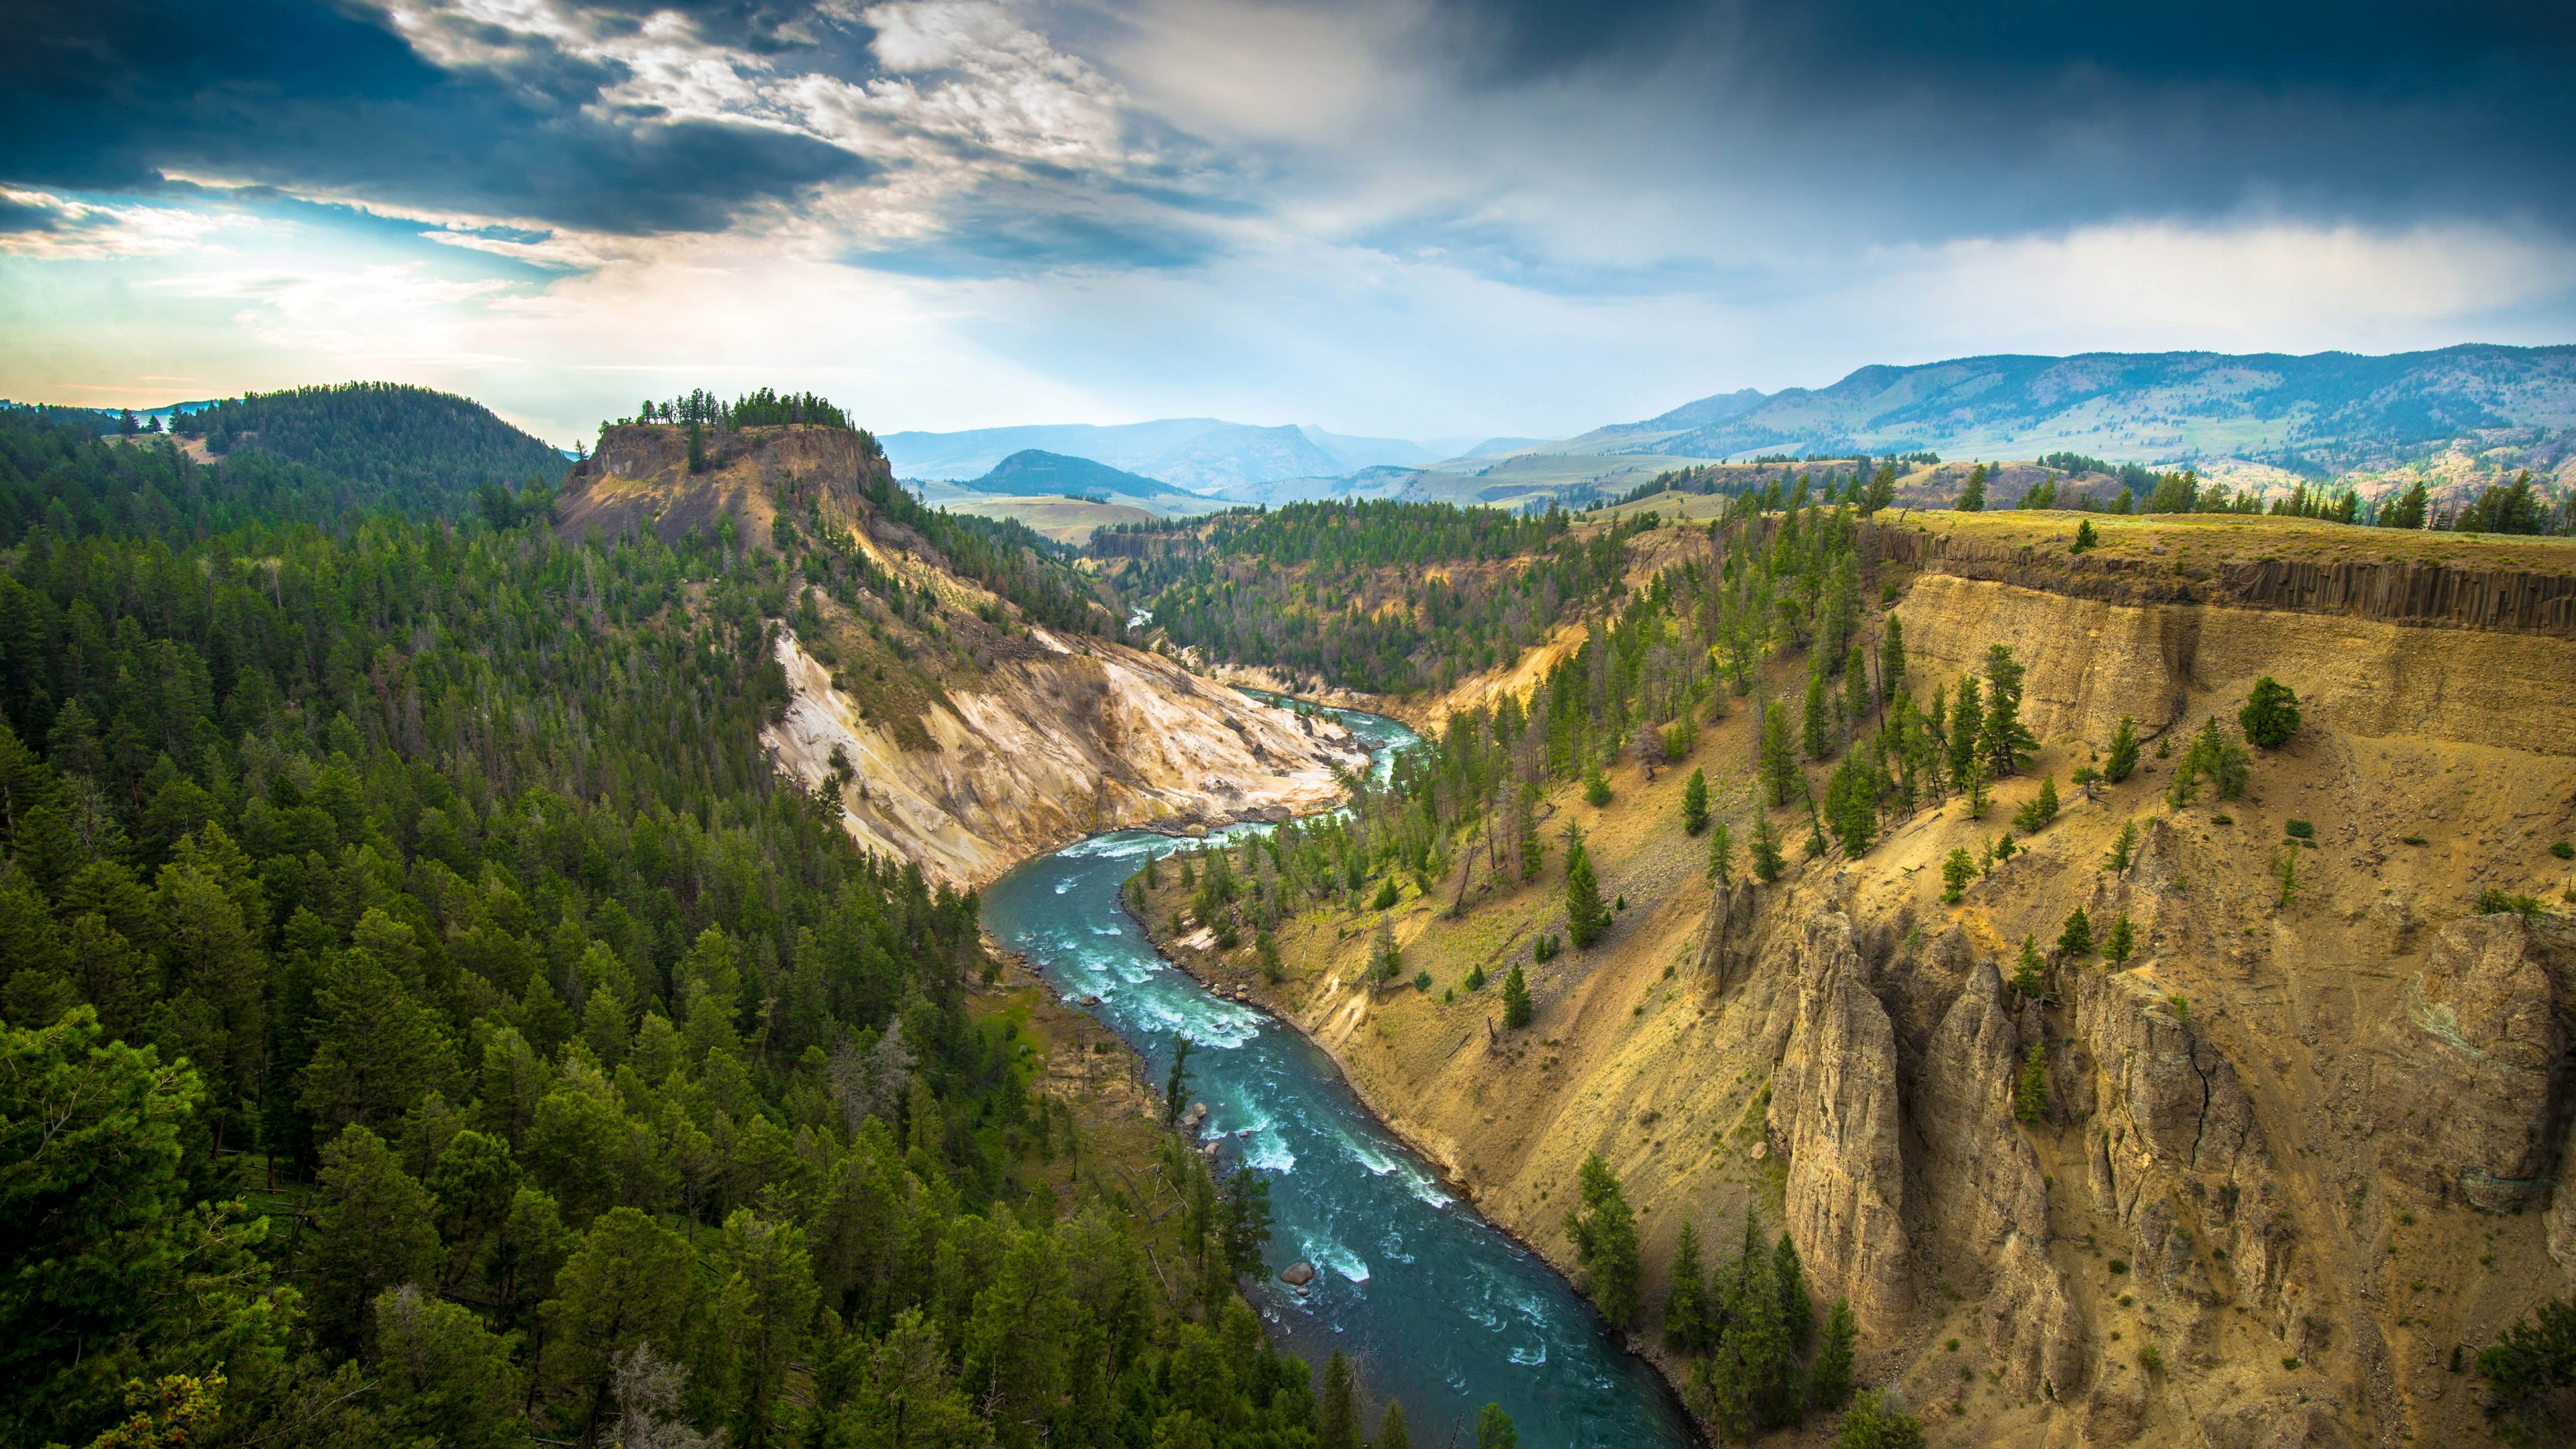 of Yellowstone National Park USA Wallpaper for Desktop 4K 3840 x 2160 3840x2160